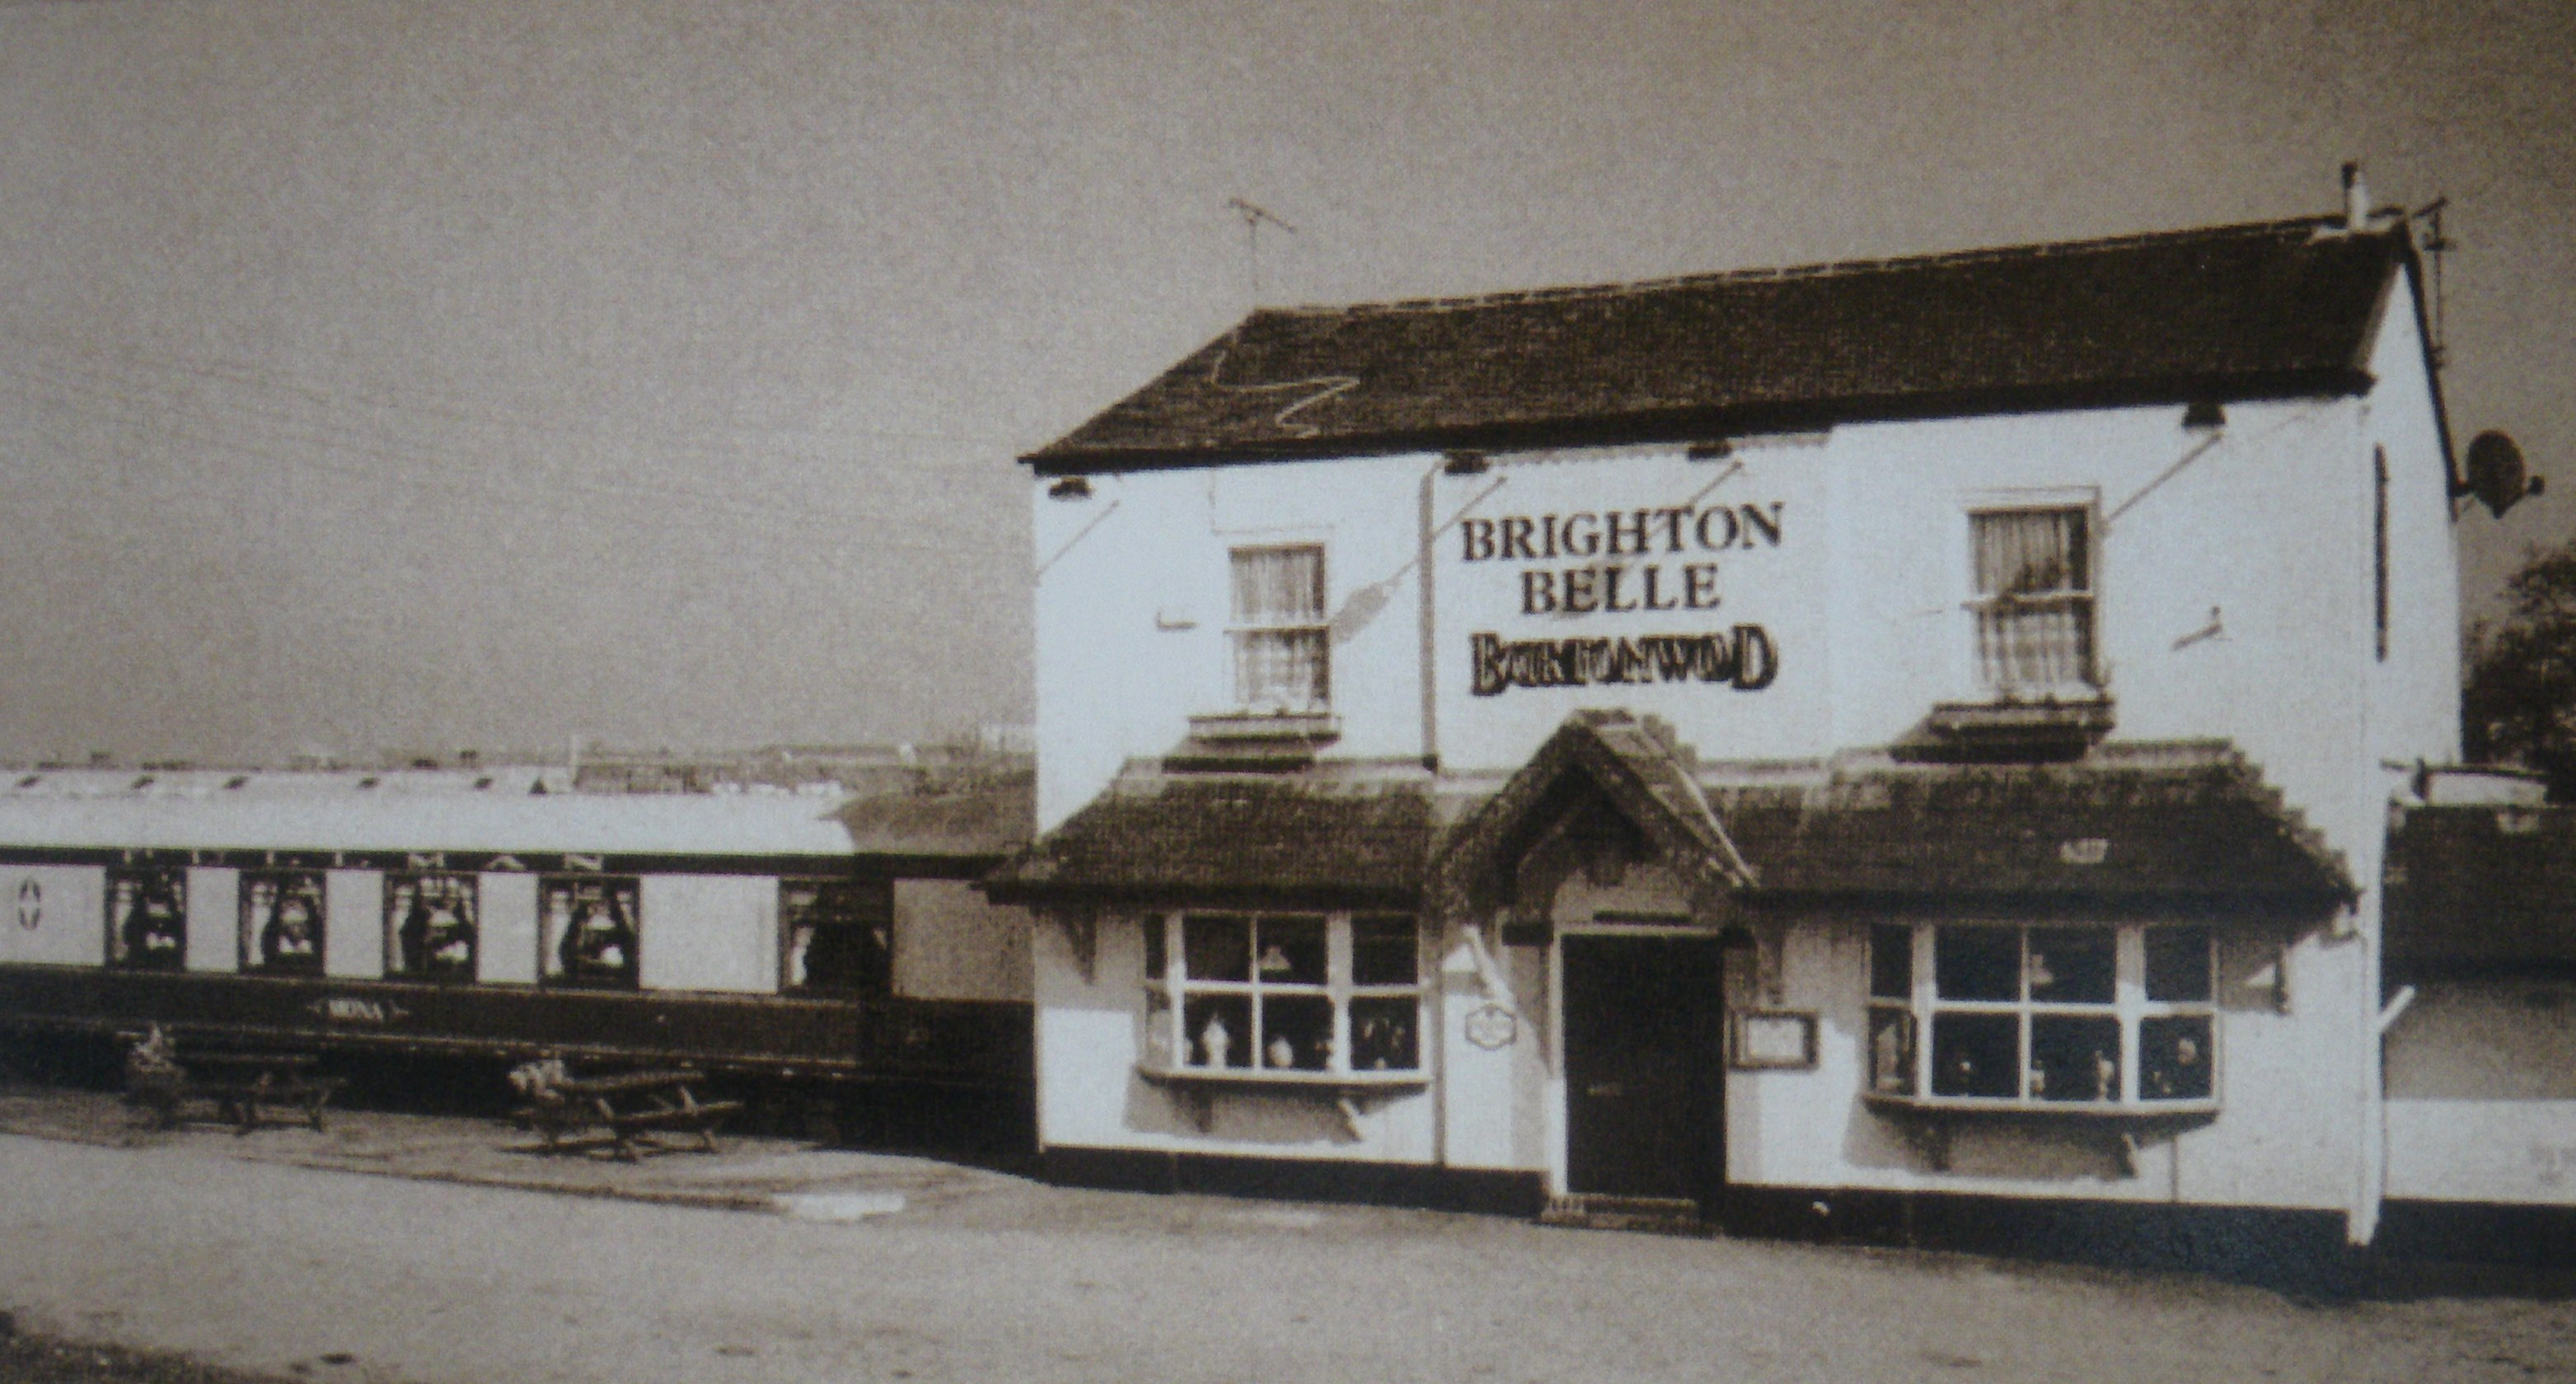 New Brighton Ford >> Public Buildings in Winsford's History